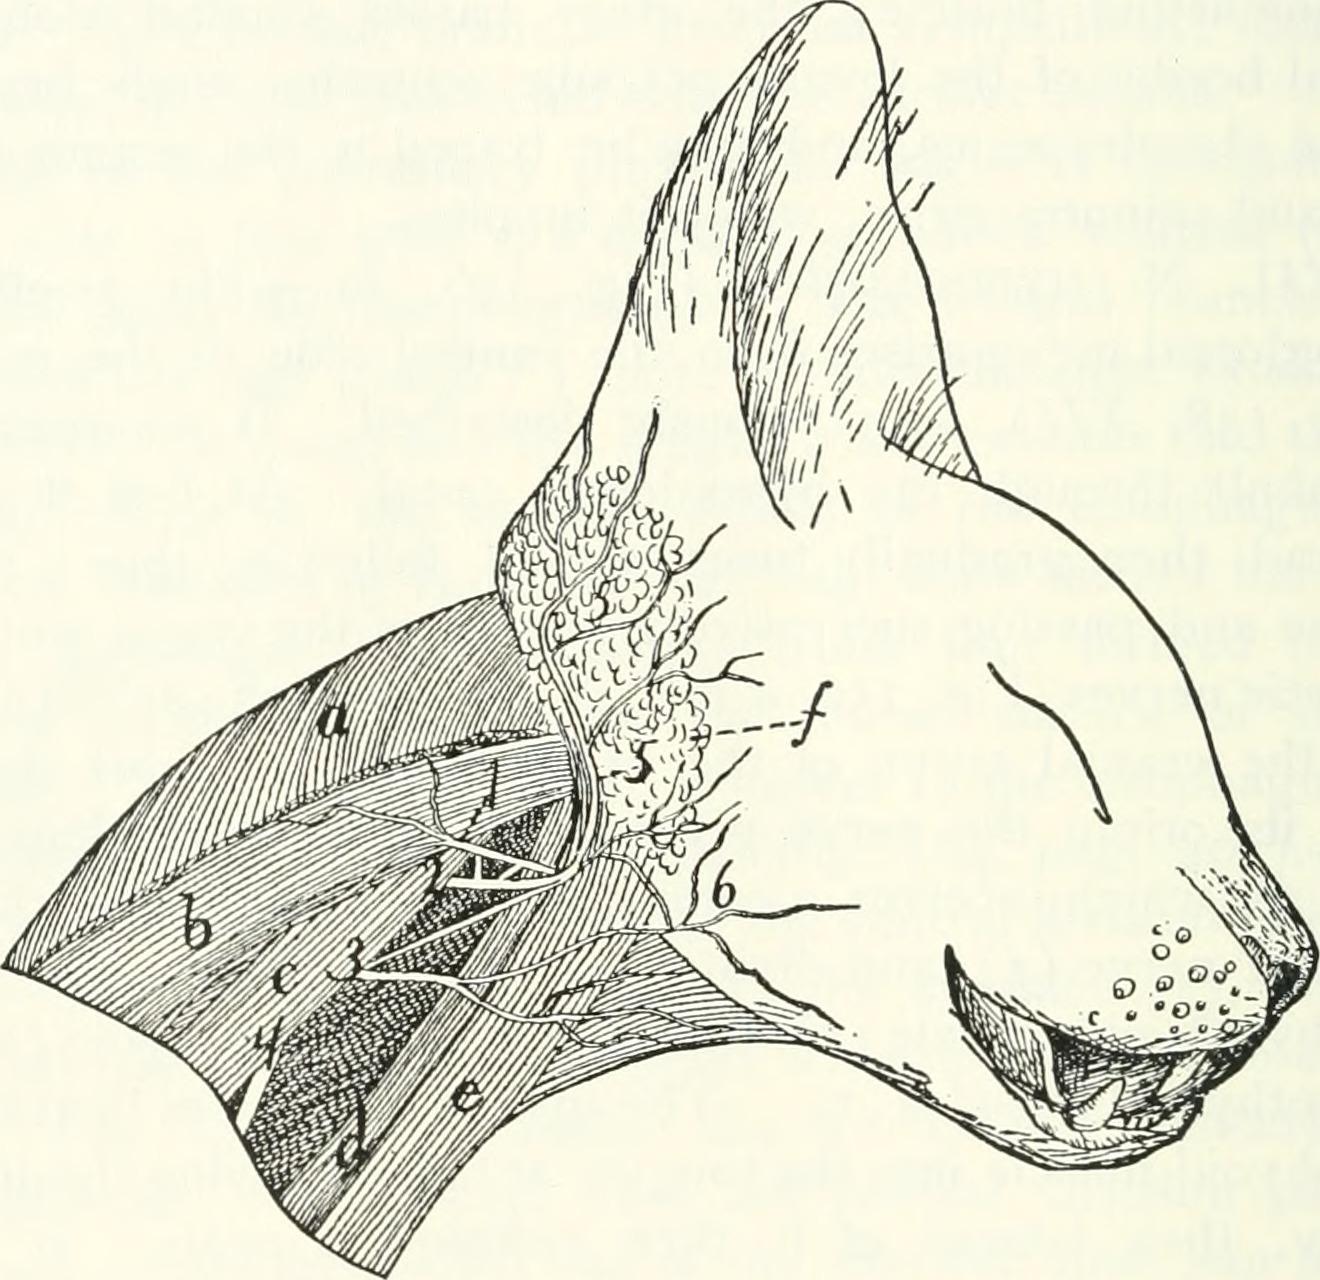 File:Anatomy of the cat (1991) (18167751726).jpg - Wikimedia Commons